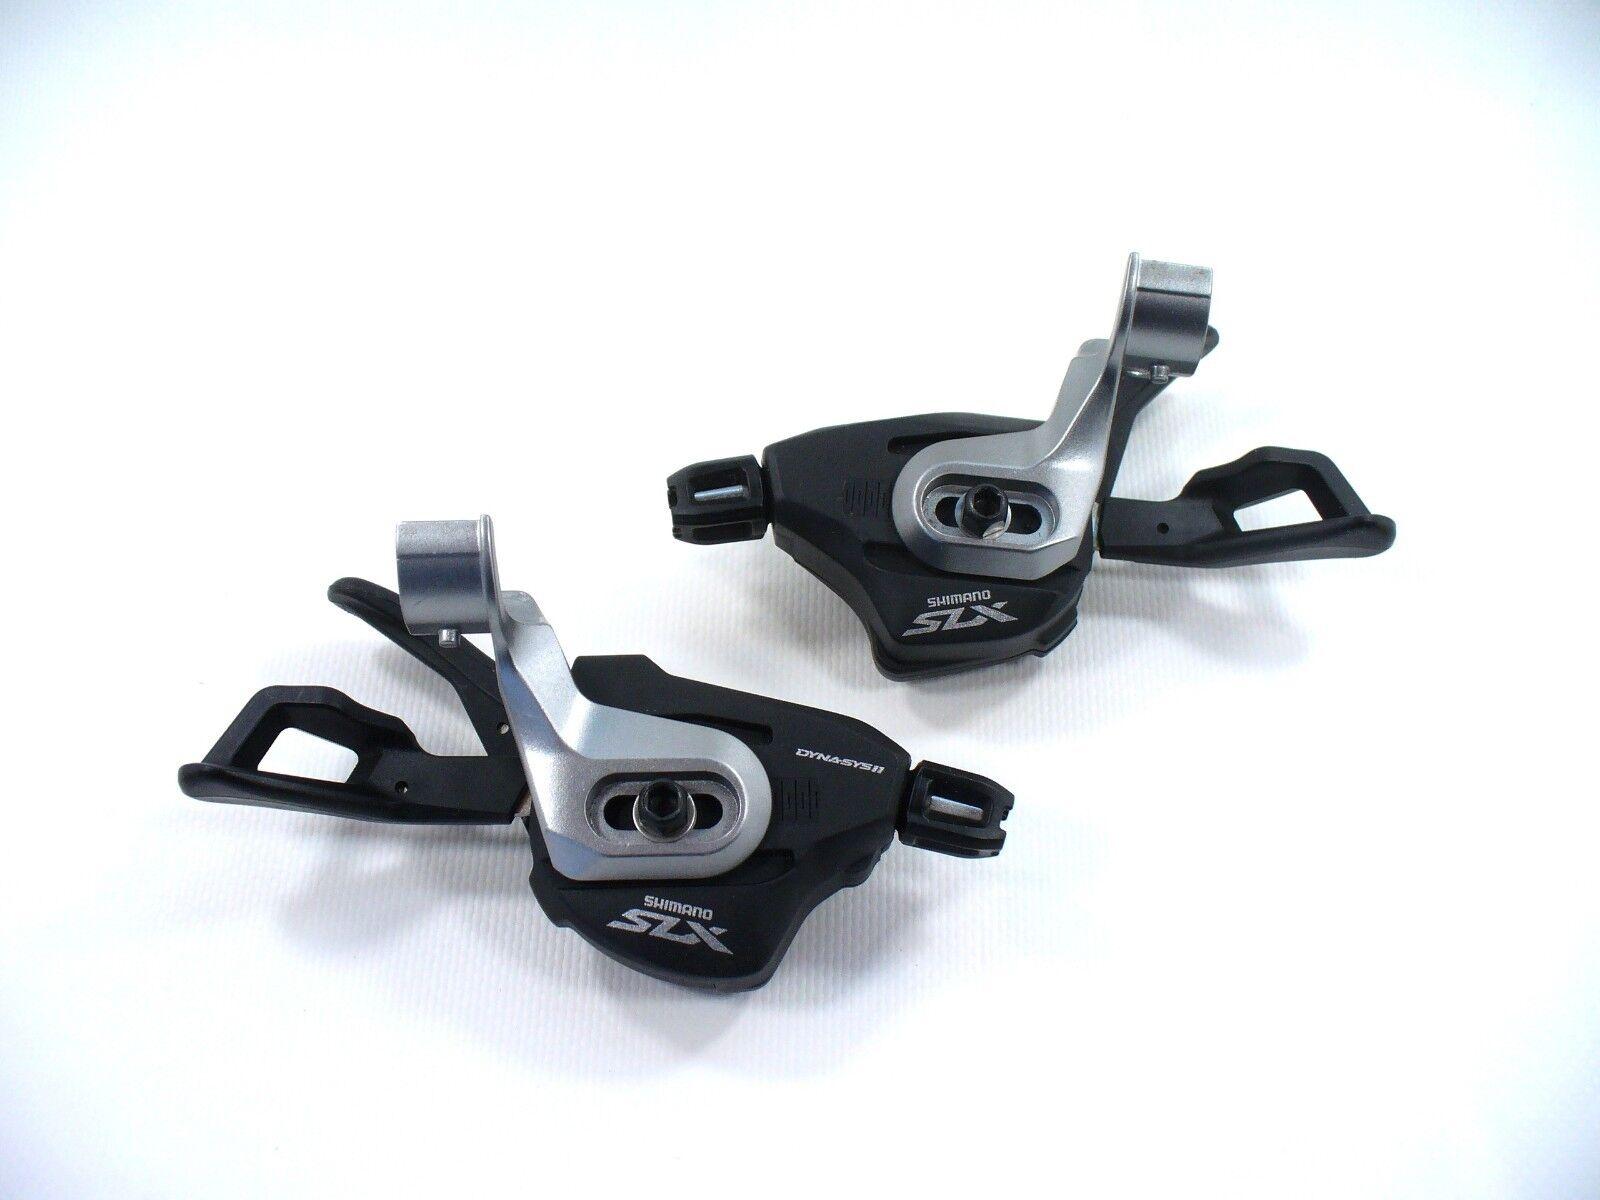 Shimano SLX SL-M7000 2x11 3x11 I-Spec II Shifters  for XC AM MTB Left Right Pair  latest styles